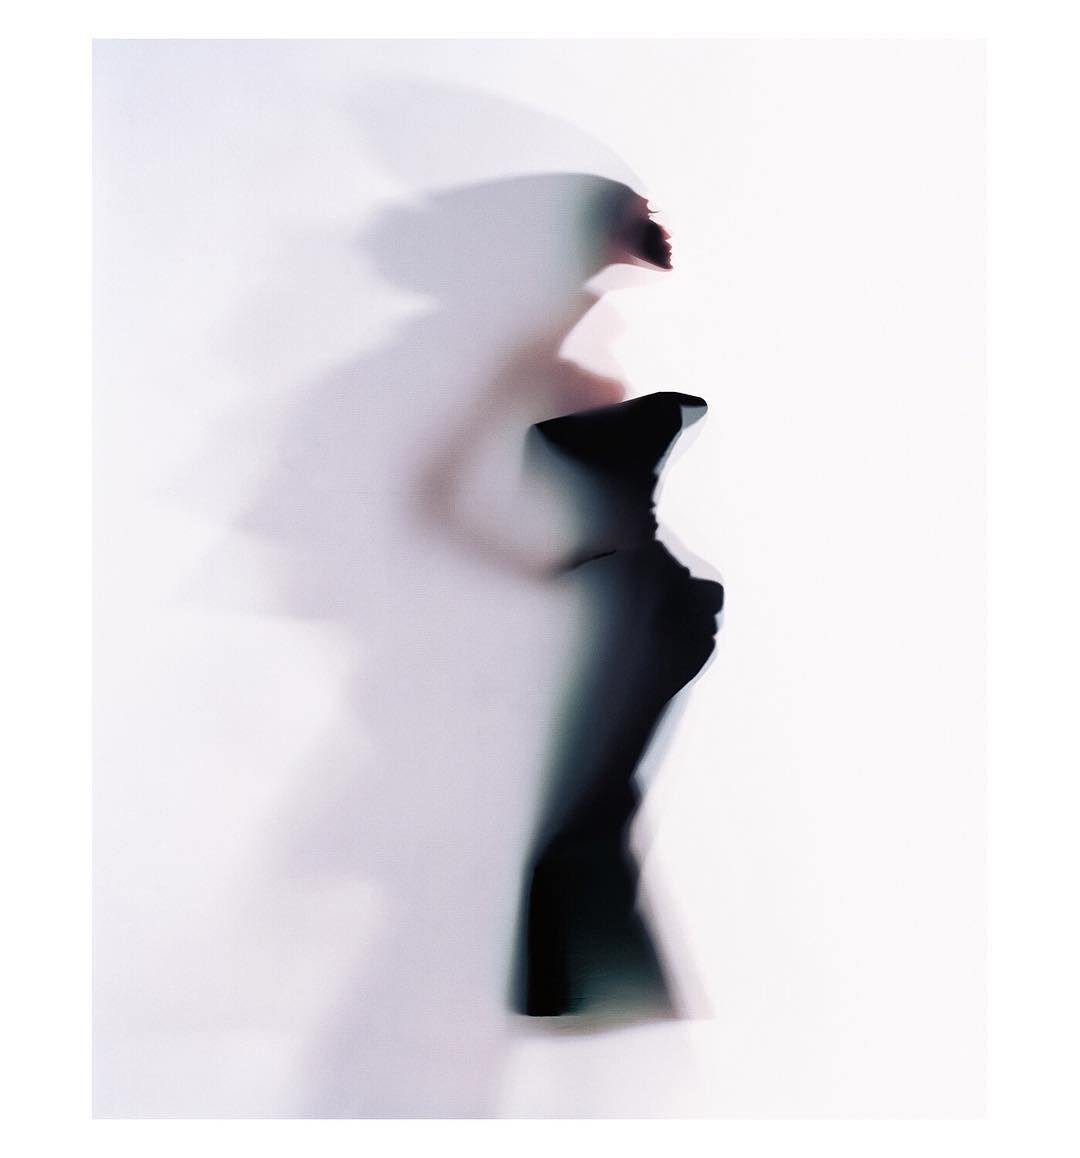 Ralph Mecke @ralphmecke #dailyinspiration #friday  #dltd_scenes #magazine #onlinemagazine #publication #fashion #mode #beauty #editorial #photography #photoshoot #photography #stilllife #stilleben #stilllifephotography #setdesign #setdesigner #props #installation #stockholm #sweden #sverige #scandinavian #norden #instaphotos